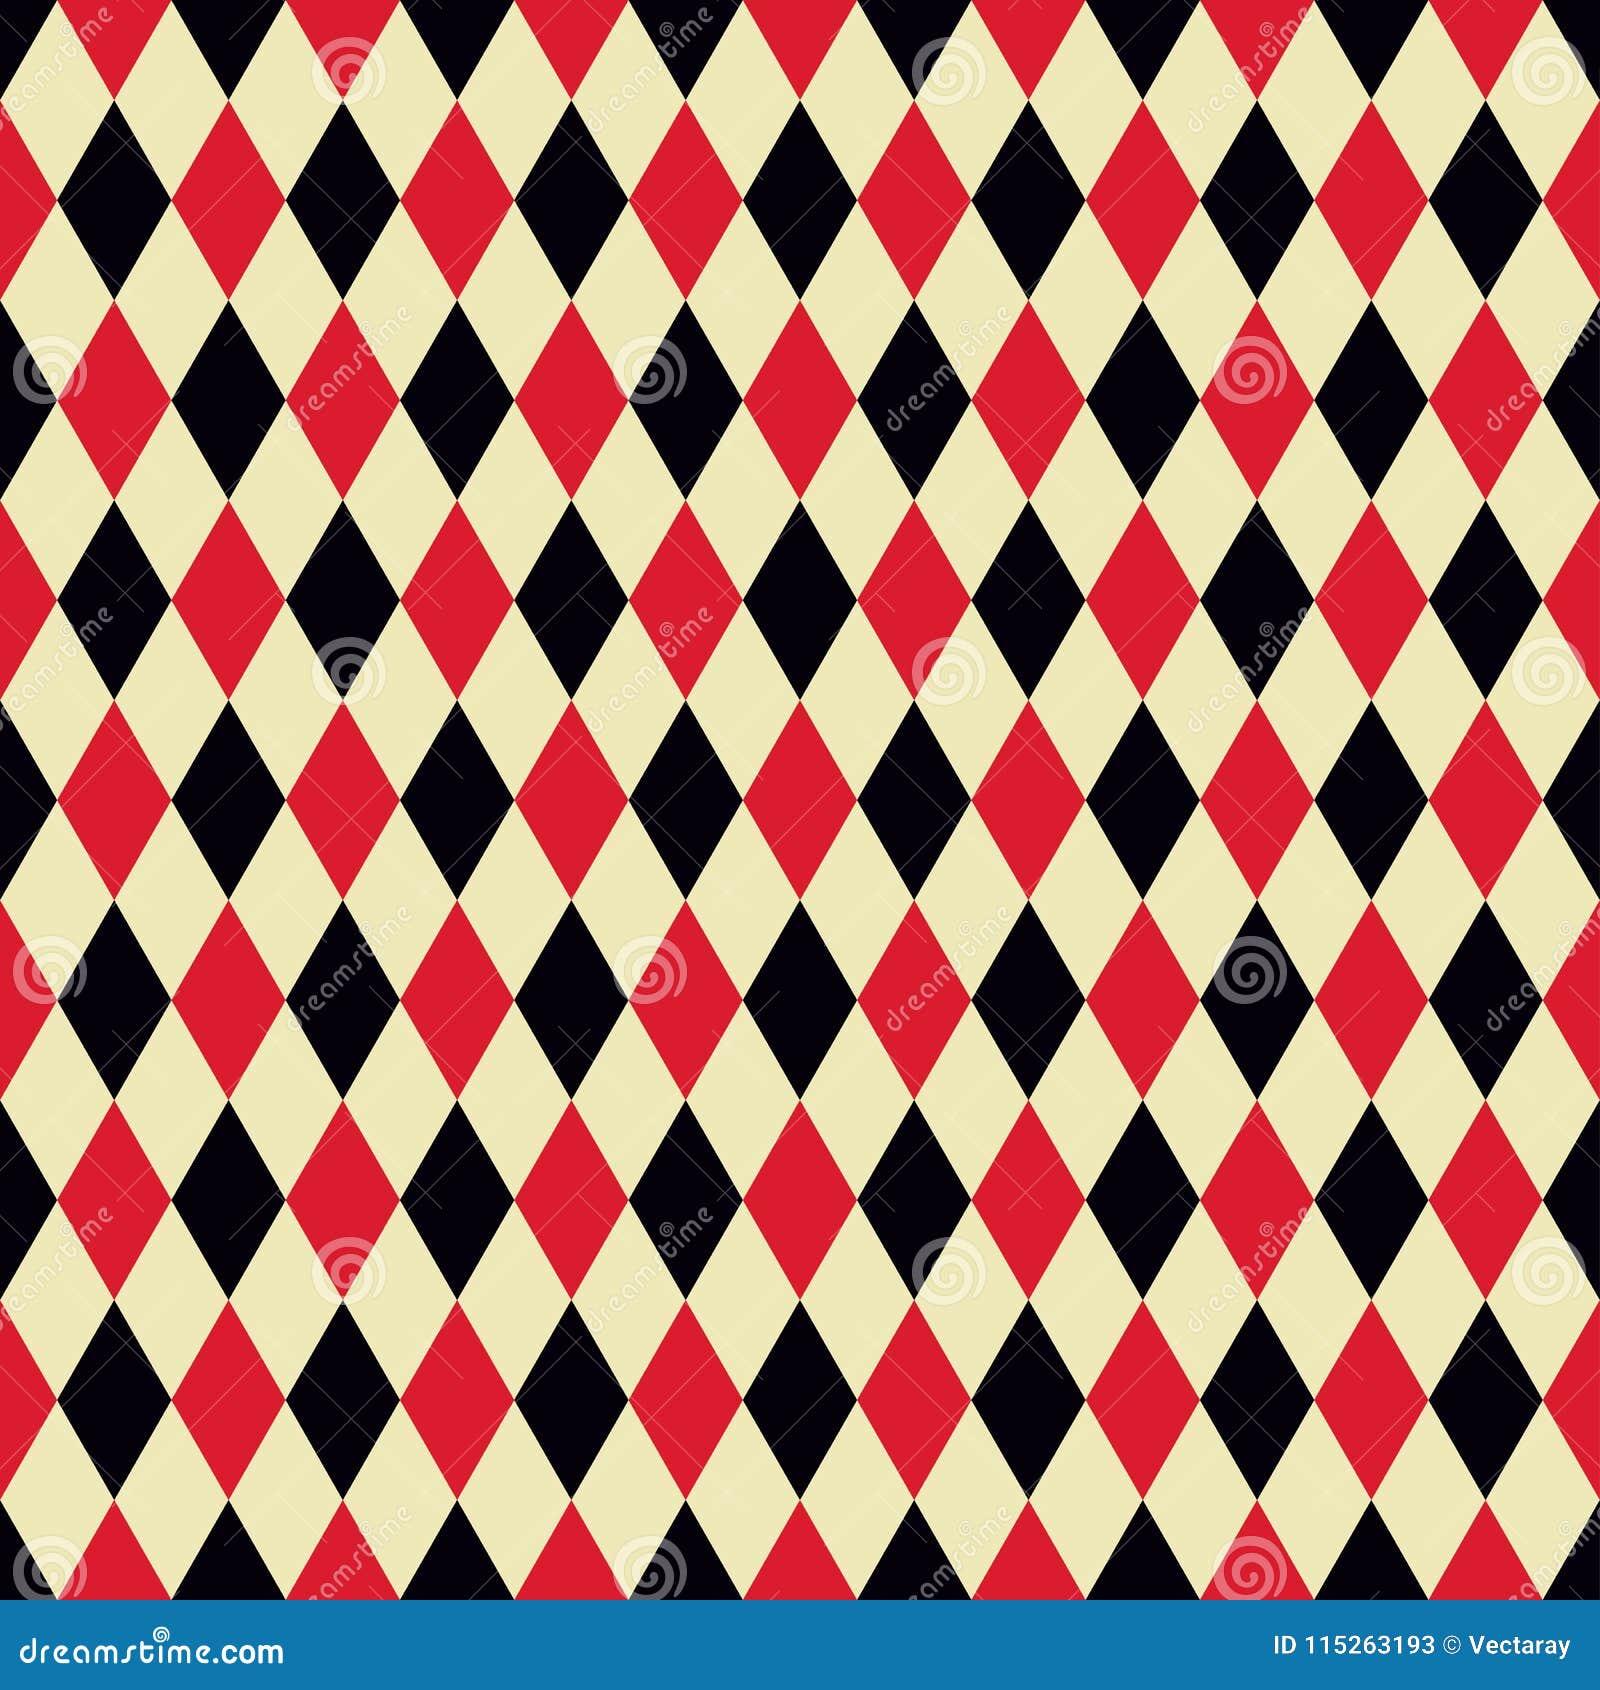 Seamless Argyle Fabric Pattern Background